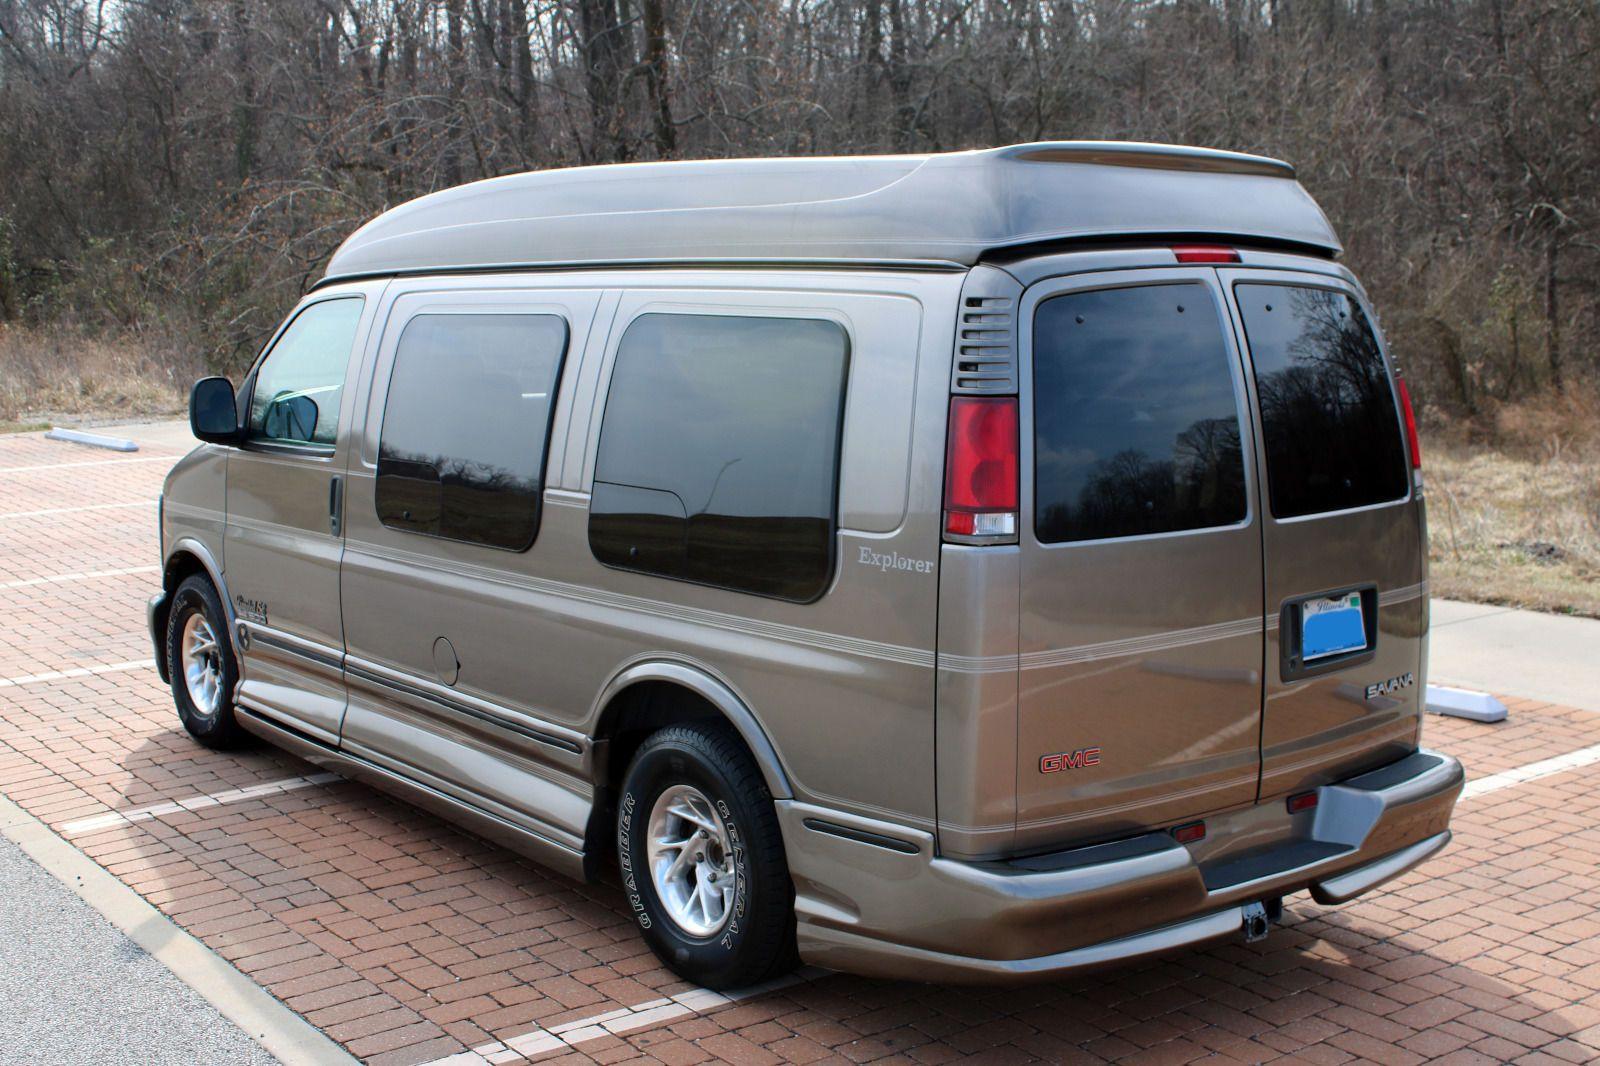 2000 gmc savana explorer ebay chevrolet van chevy express custom vans gmc [ 1600 x 1066 Pixel ]